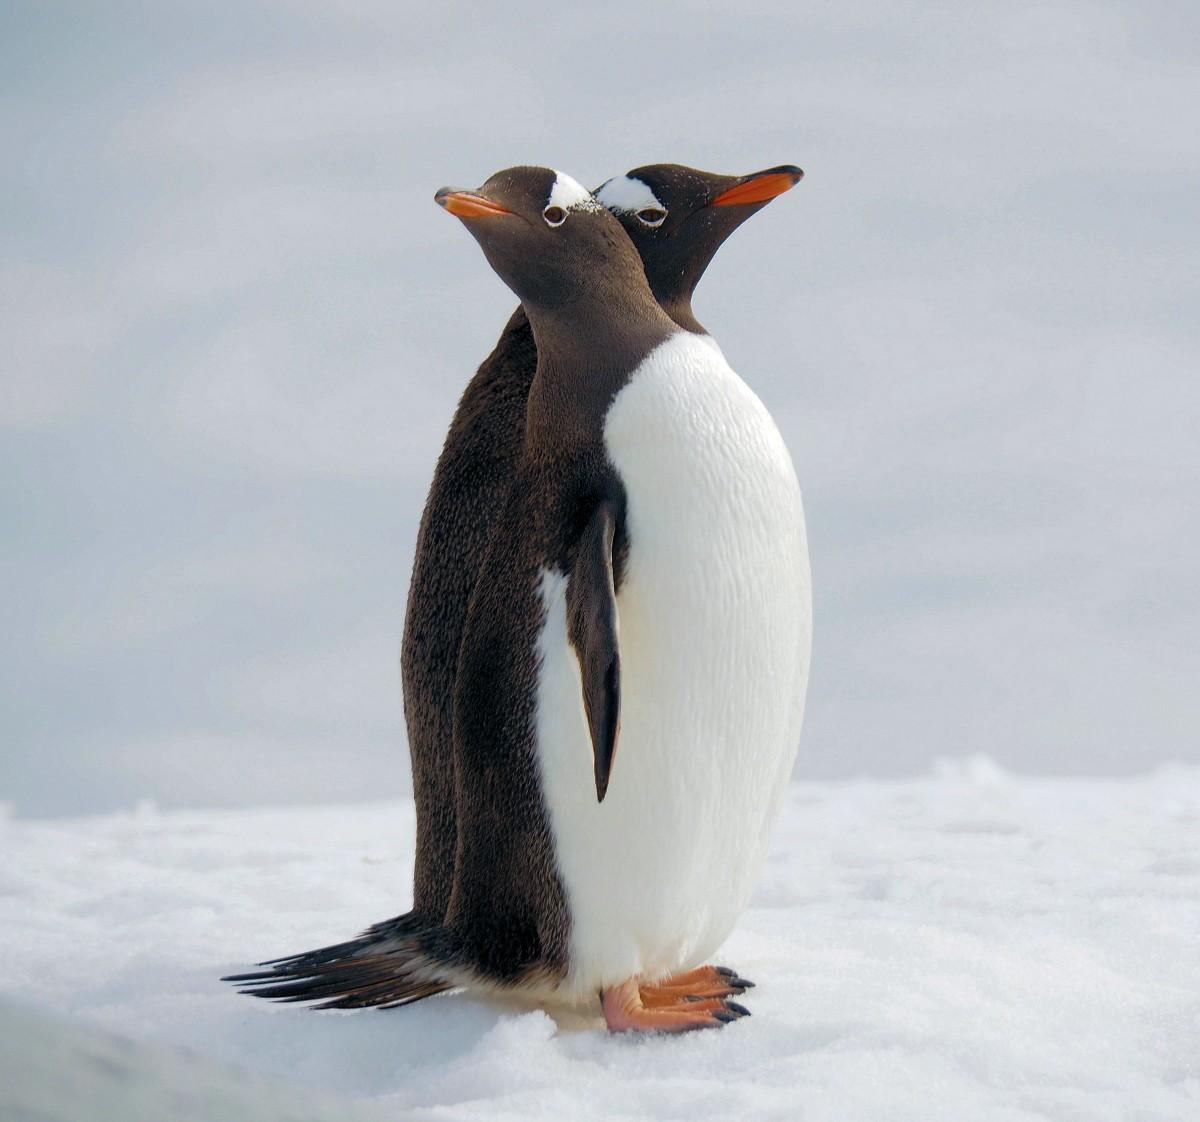 Zdjęcia: Antarktyda, Antarctic Peninsula, Przyjaciele, ANTARKTYDA